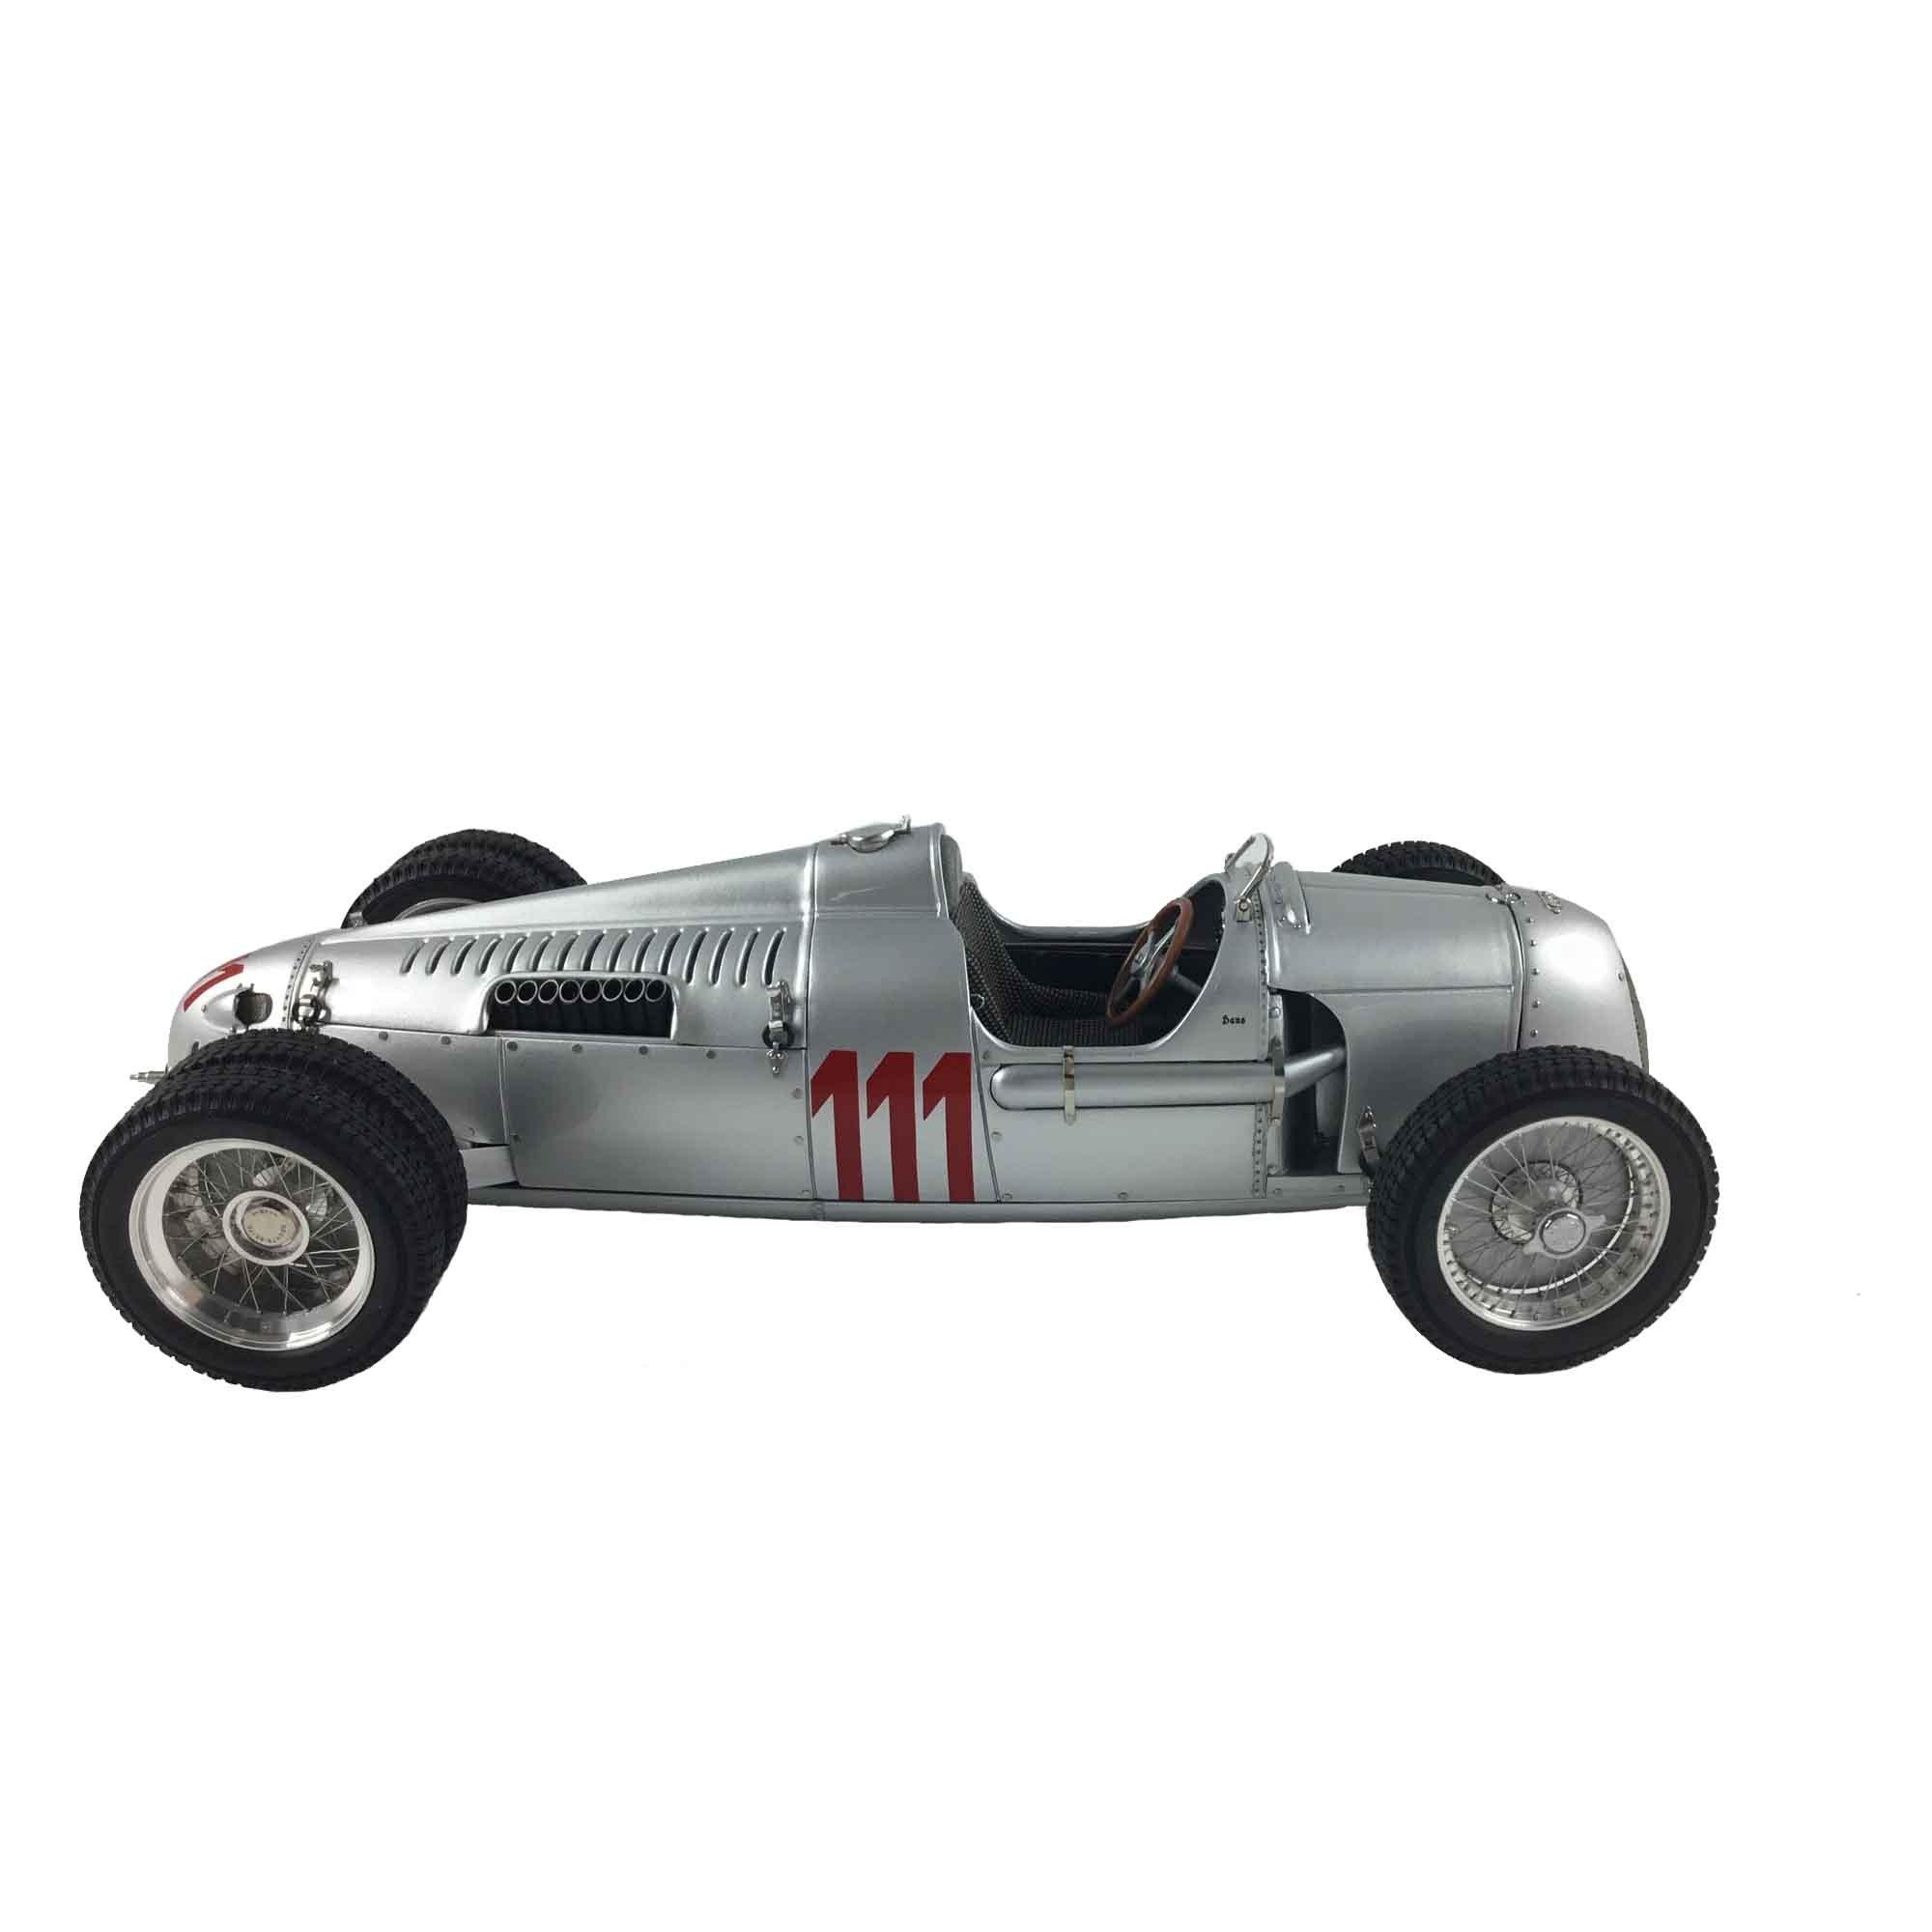 CMC-Classic Model Cars Auto Union Type C 1937 German Hillclimb #111 Struck Limited Edition Vehicle